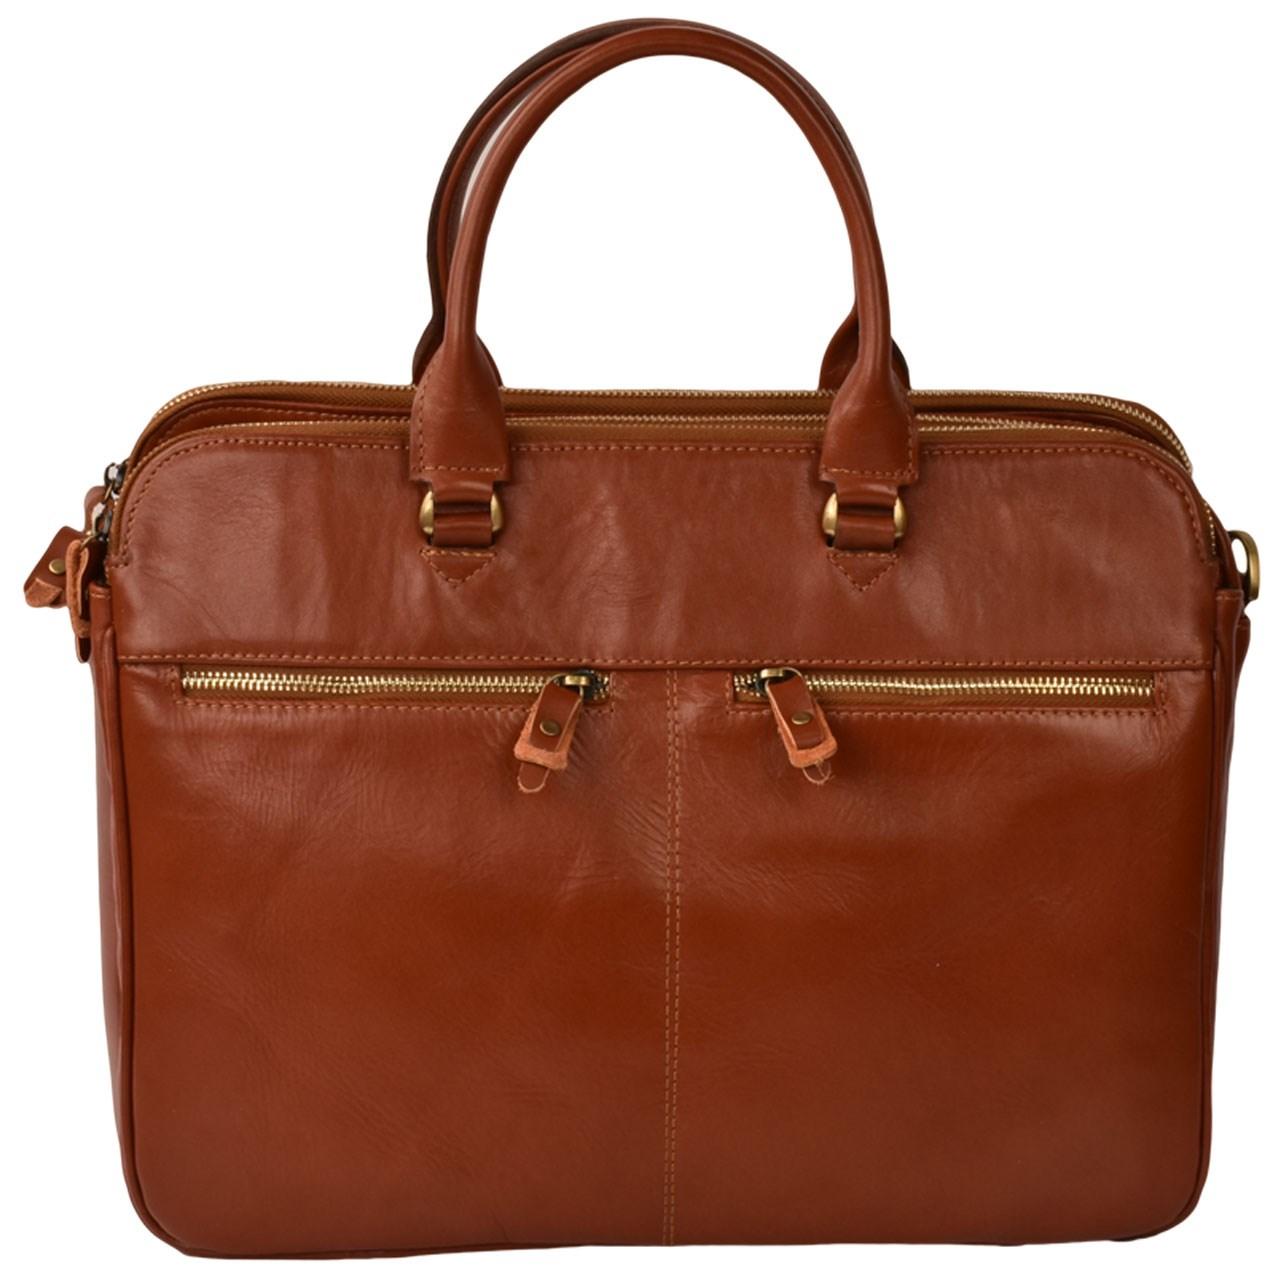 کیف اداری چرم طبیعی کهن چرم مدل L90-1